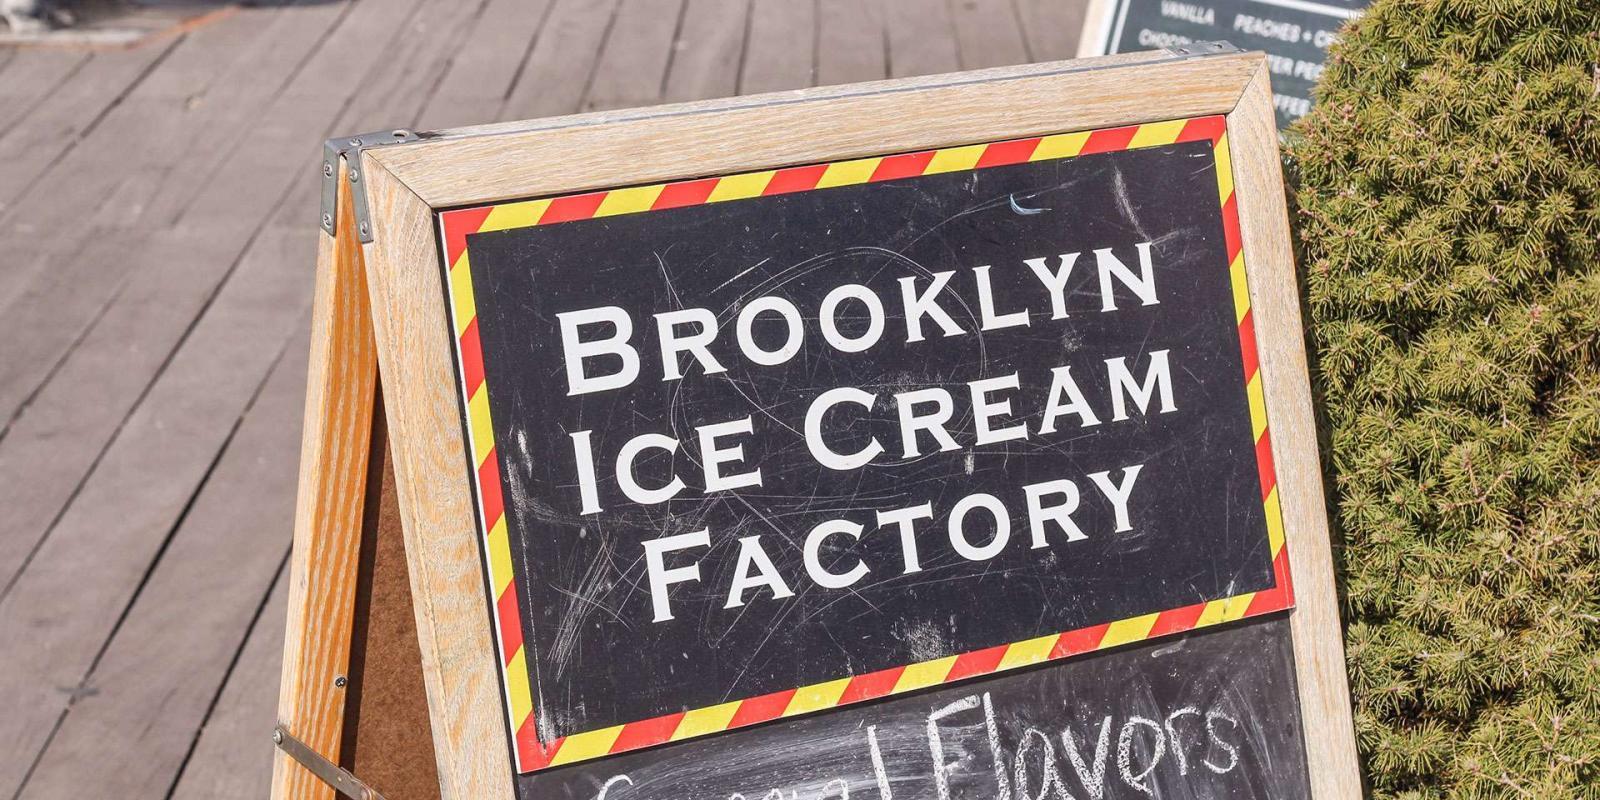 Brooklyn Ice Cream Factory (CLOSED)